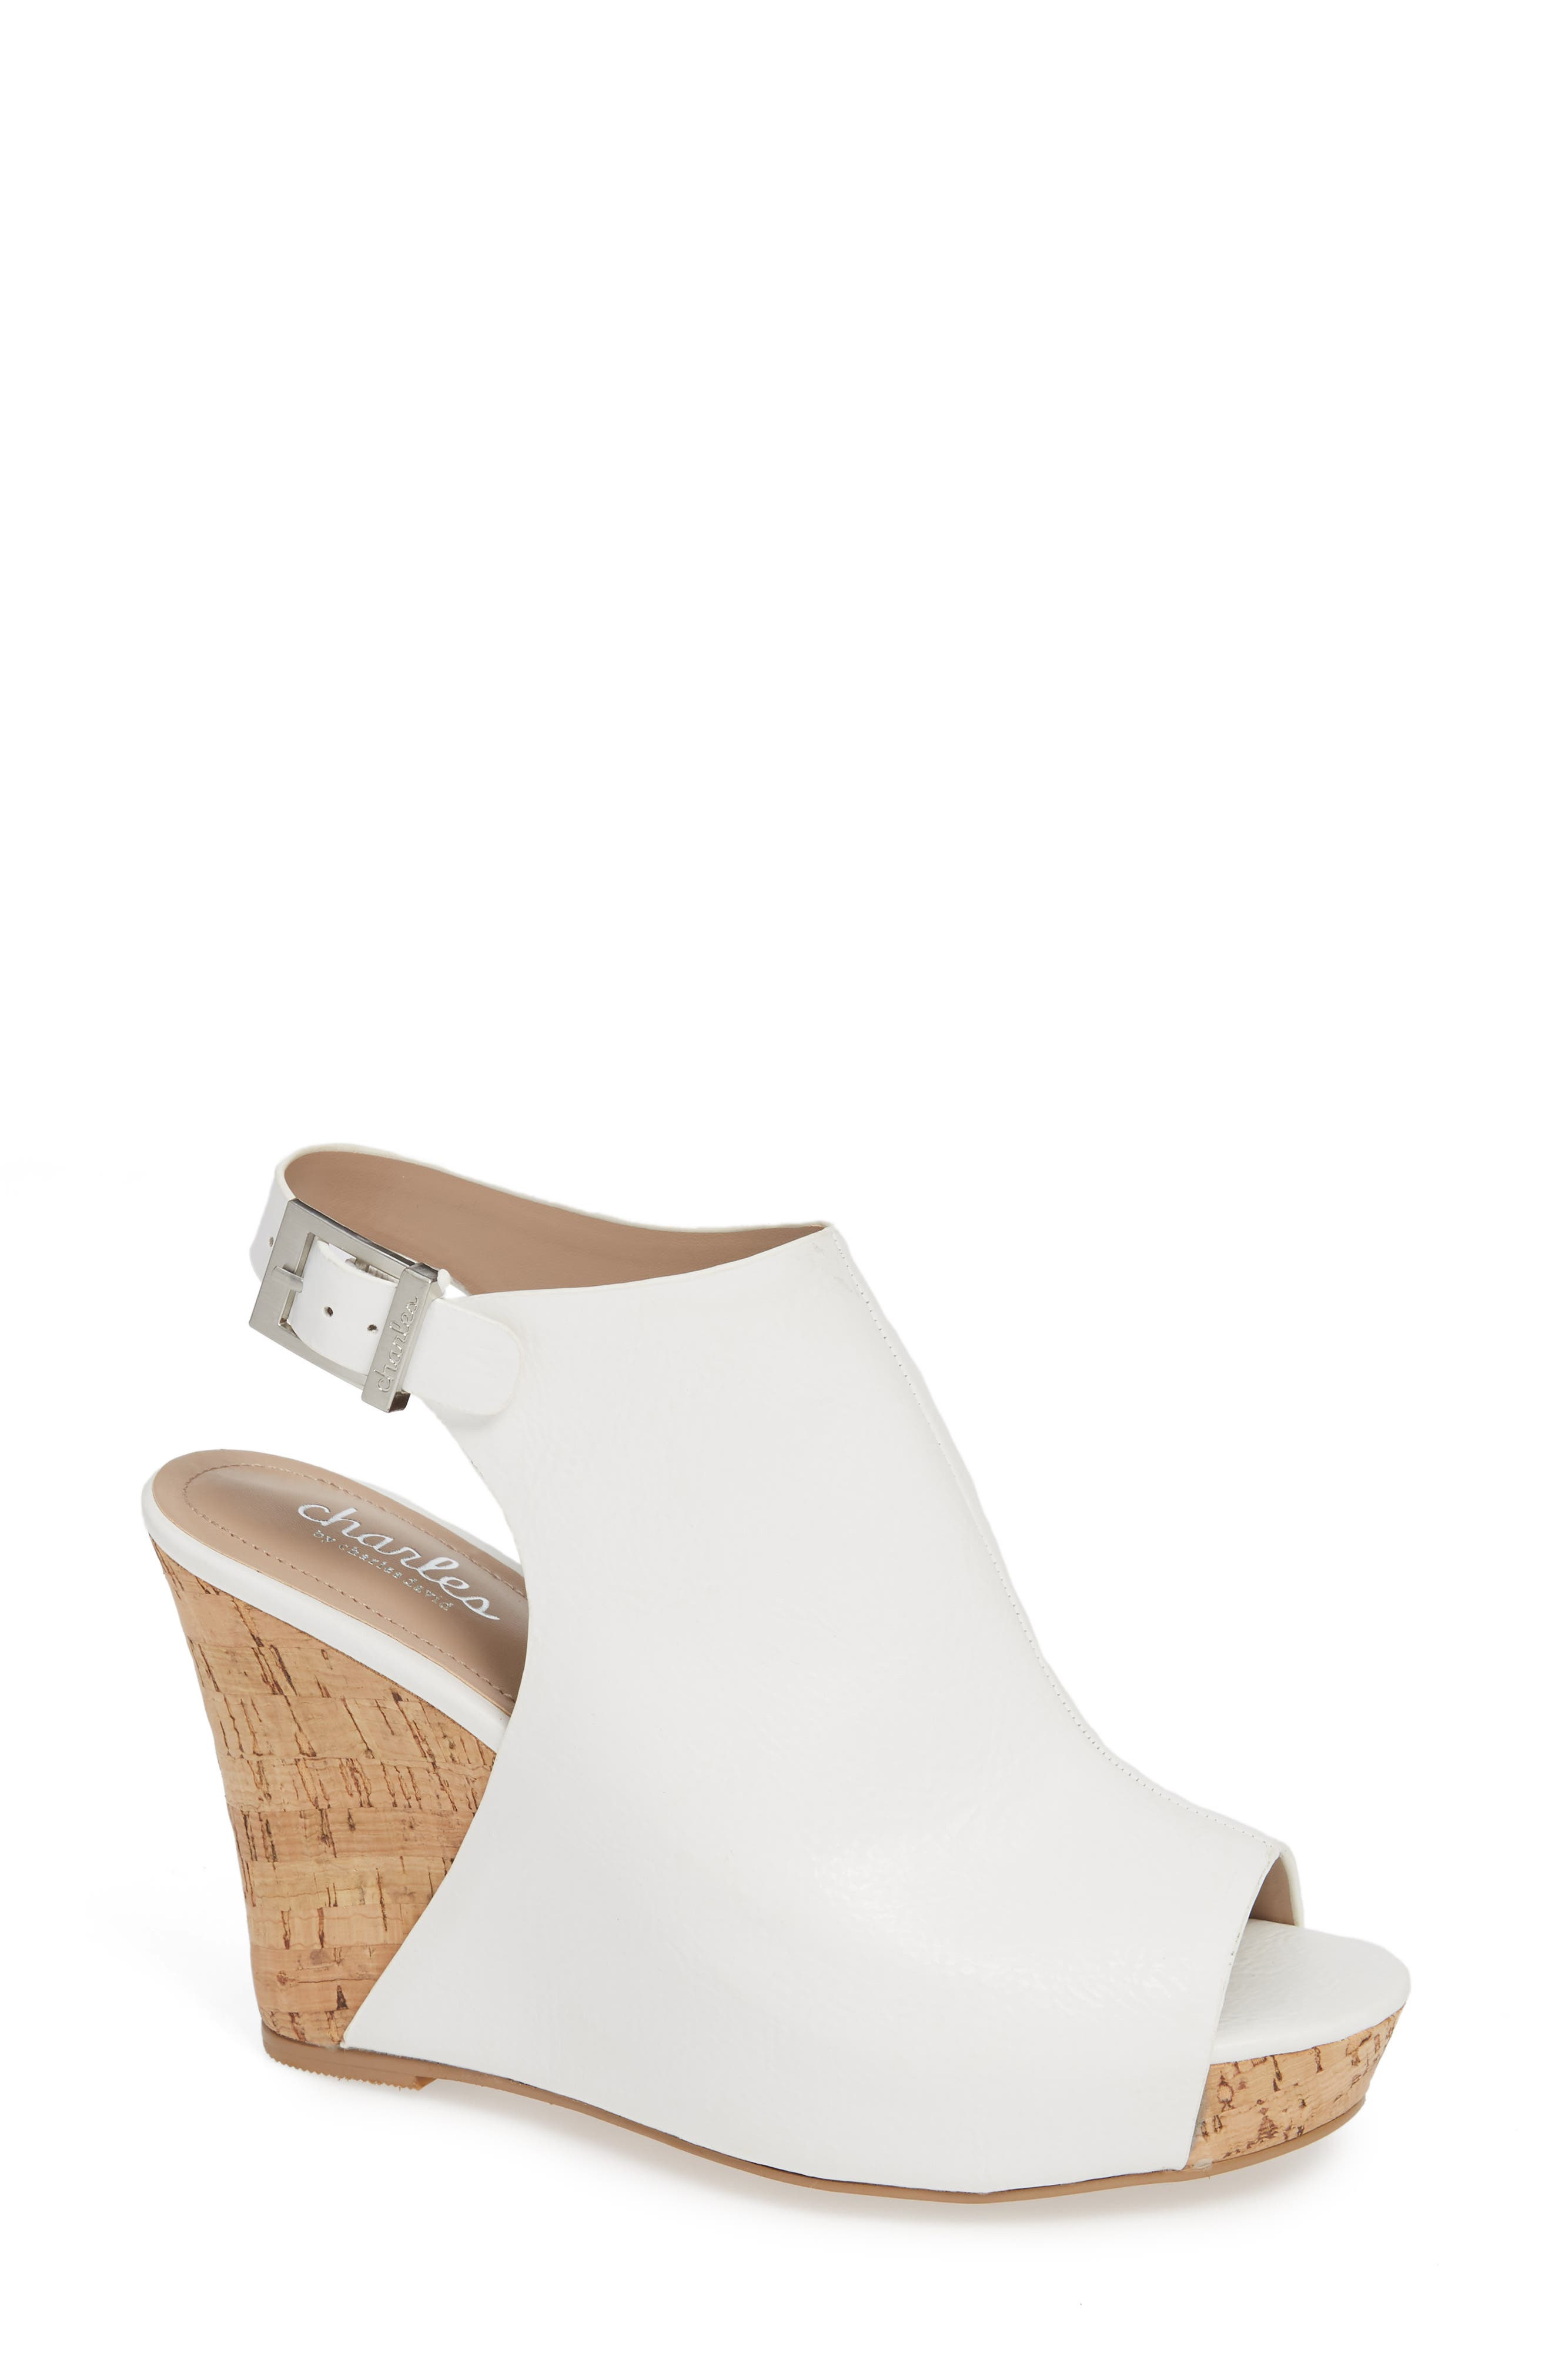 Charles By Charles David Lobby Slingback Wedge Sandal- White